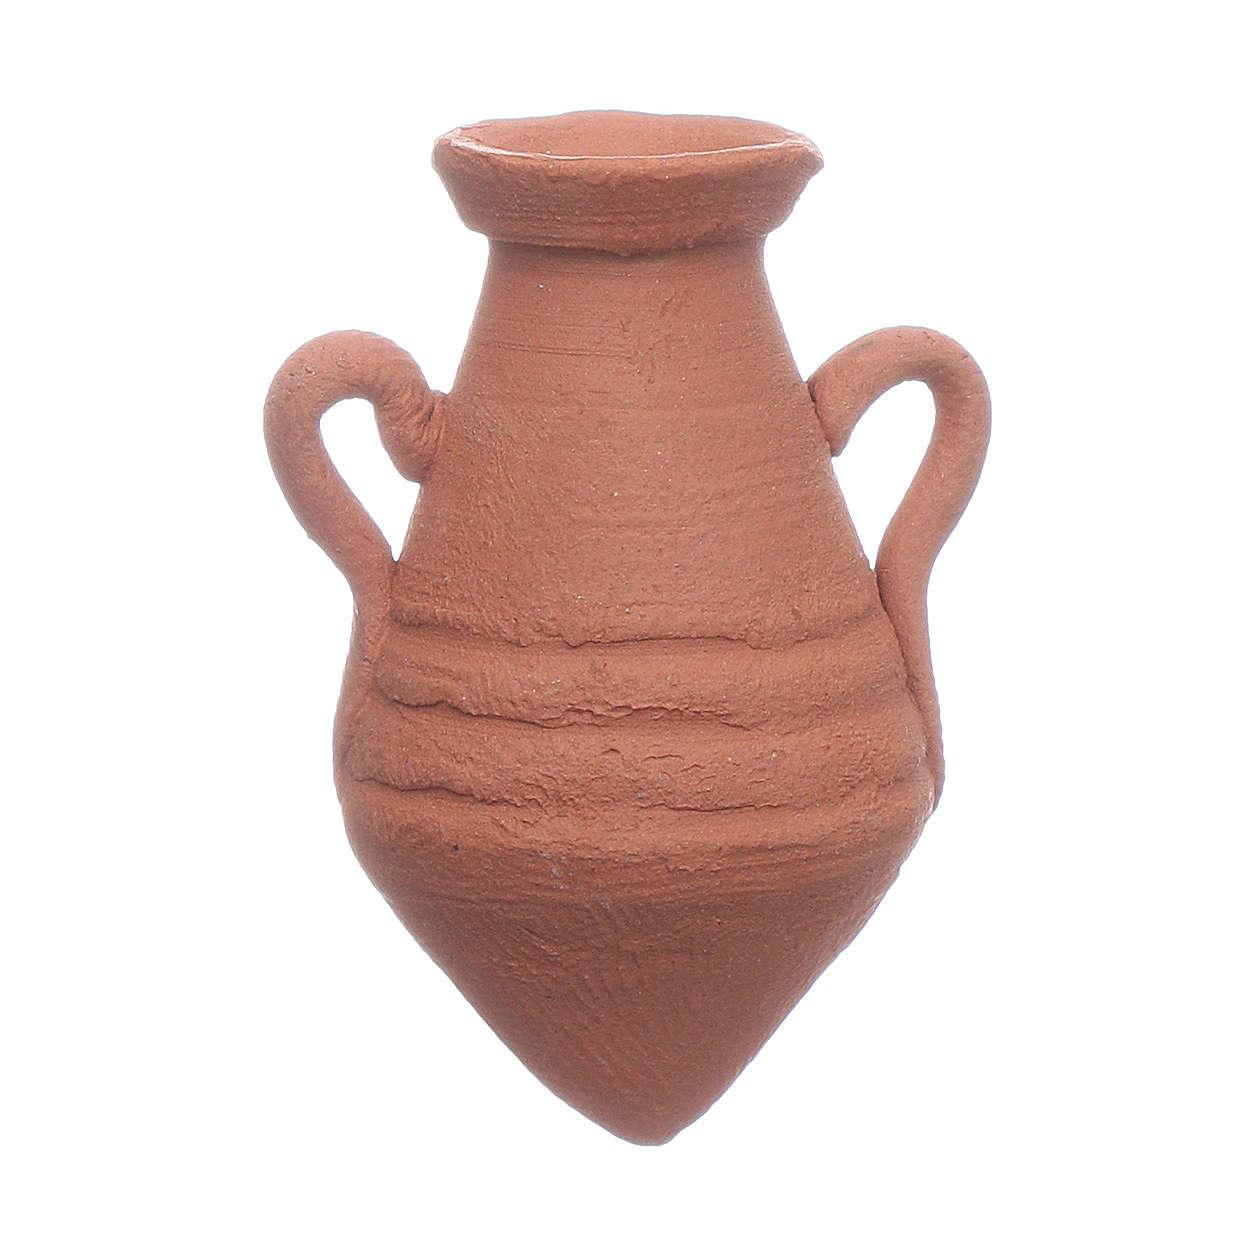 Anfora terracotta assortita 3,5x3 cm 4